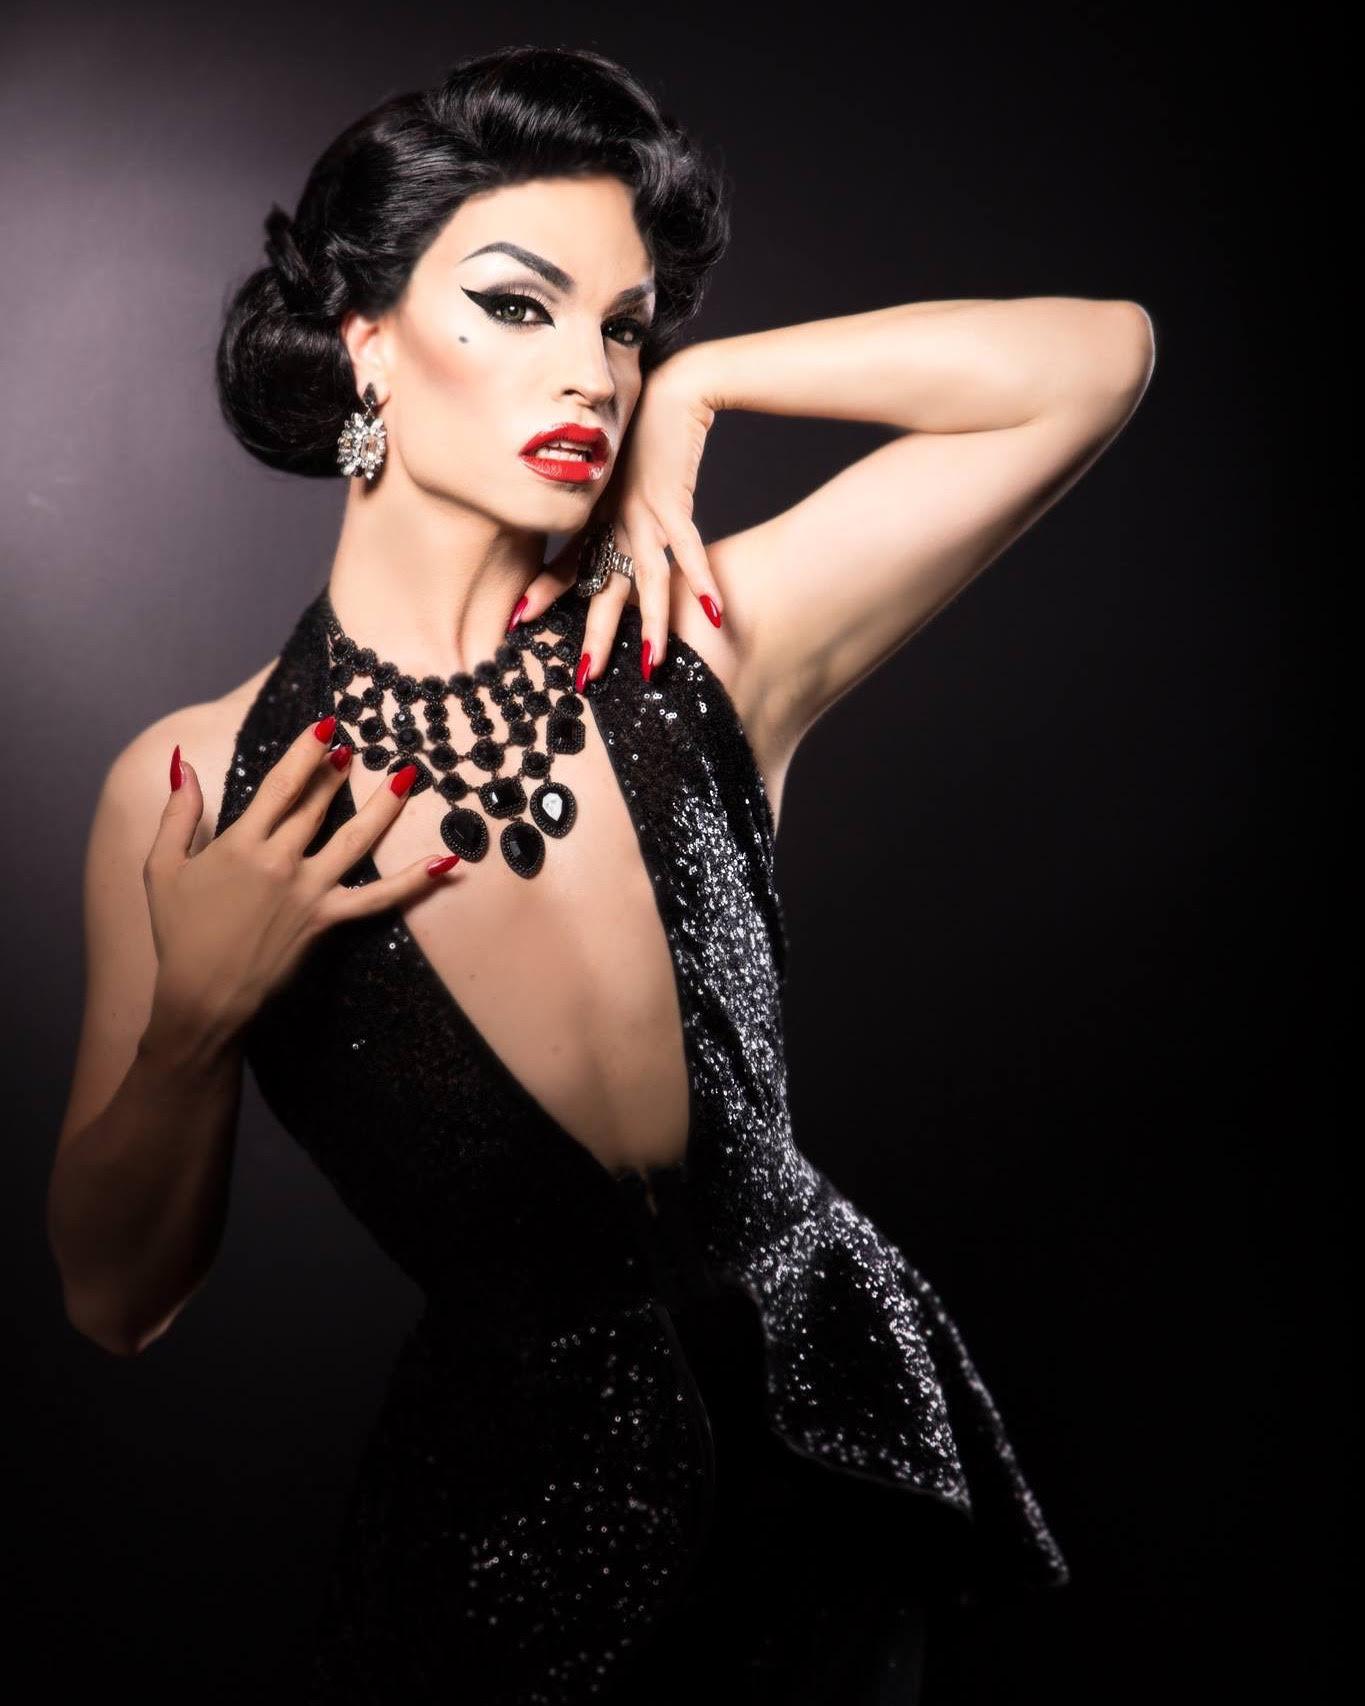 Photography: Simon Dorner  Hair: Edu von Gomes  Makeup & Styling: Tamara Mascara